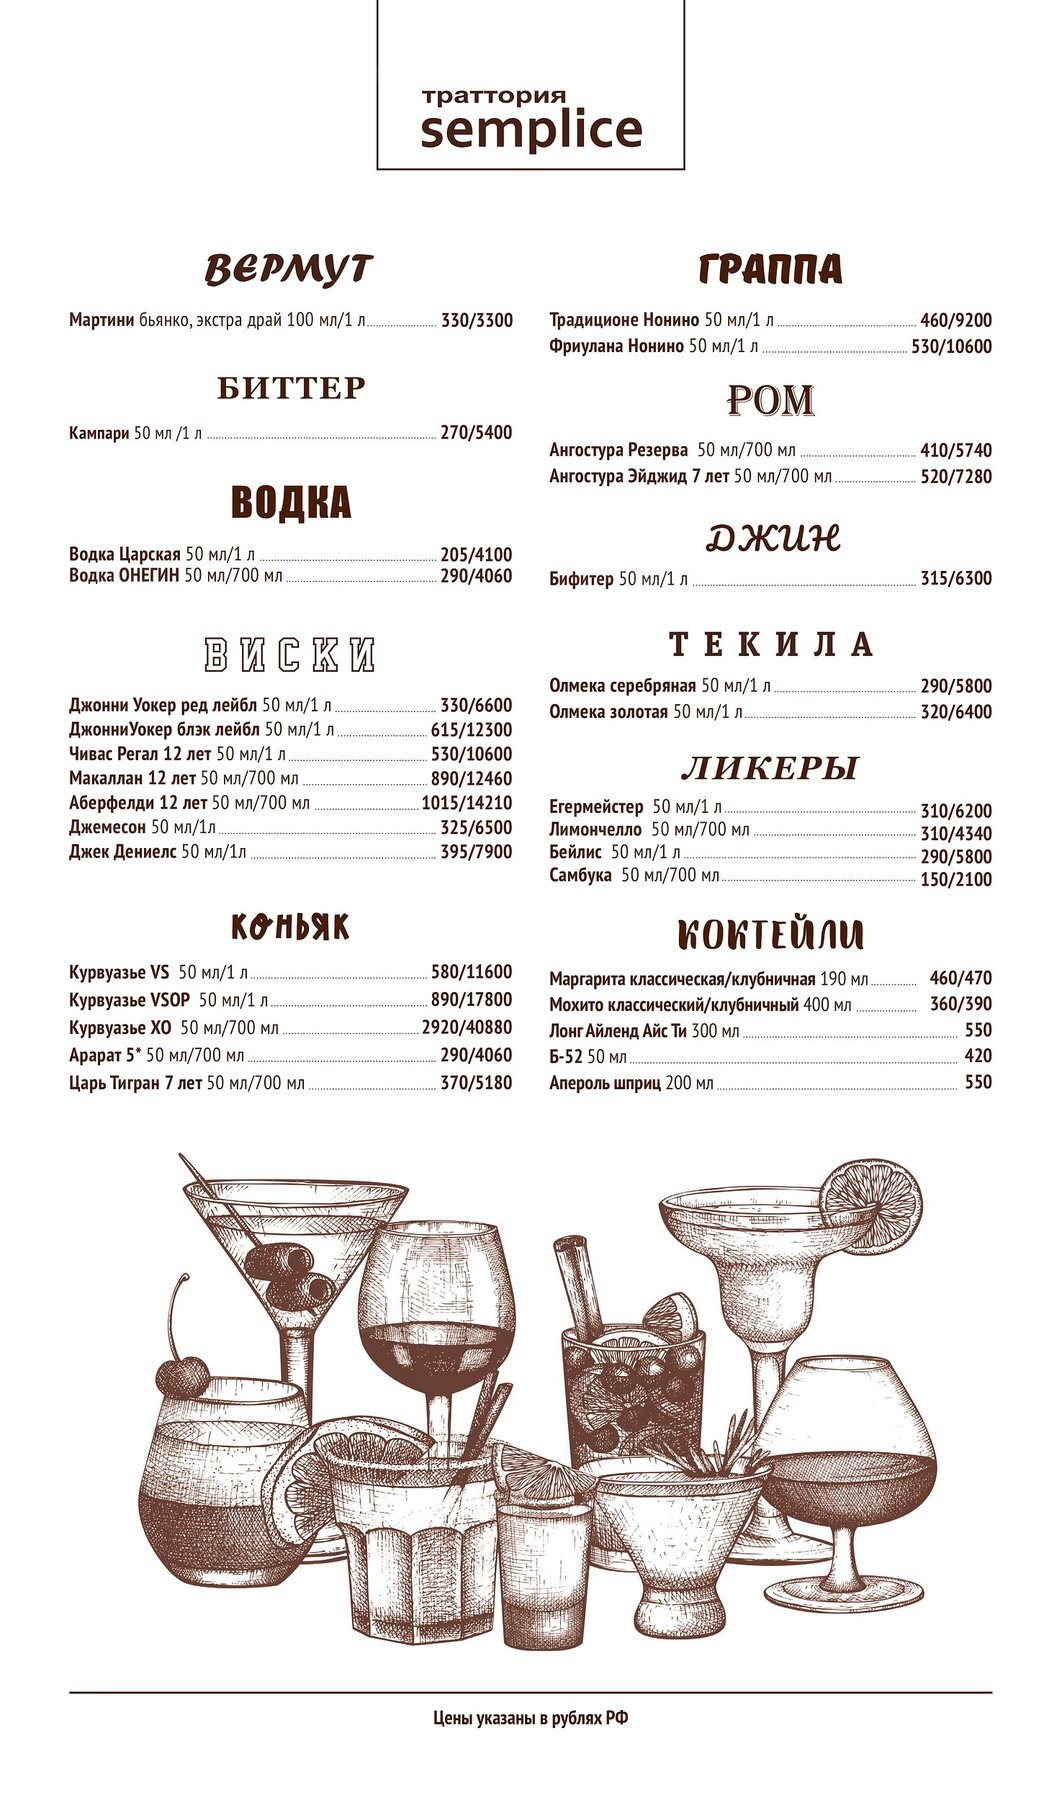 Меню ресторана Semplice (Траттория Семпличе) на улице Чаплыгина фото 4